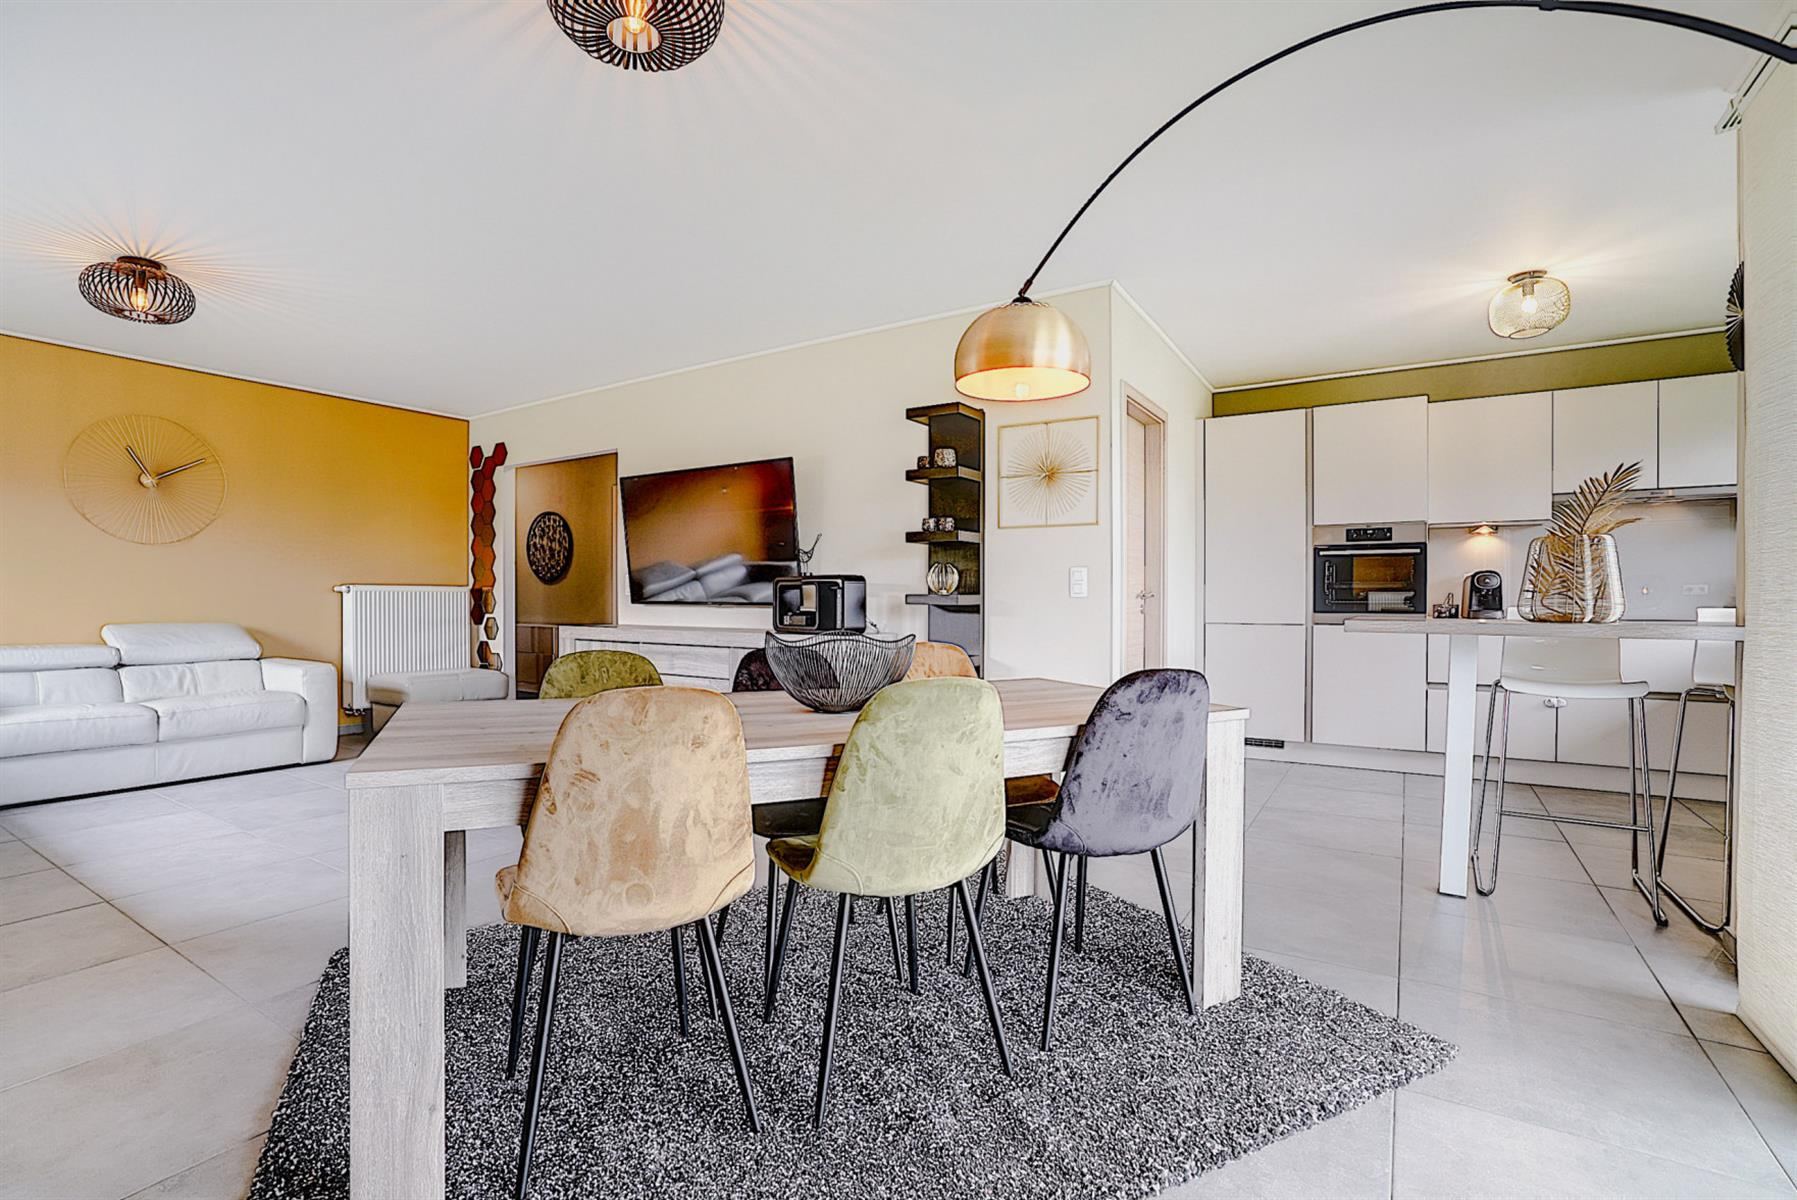 Appartement - Grâce-hollogne - #4364483-4